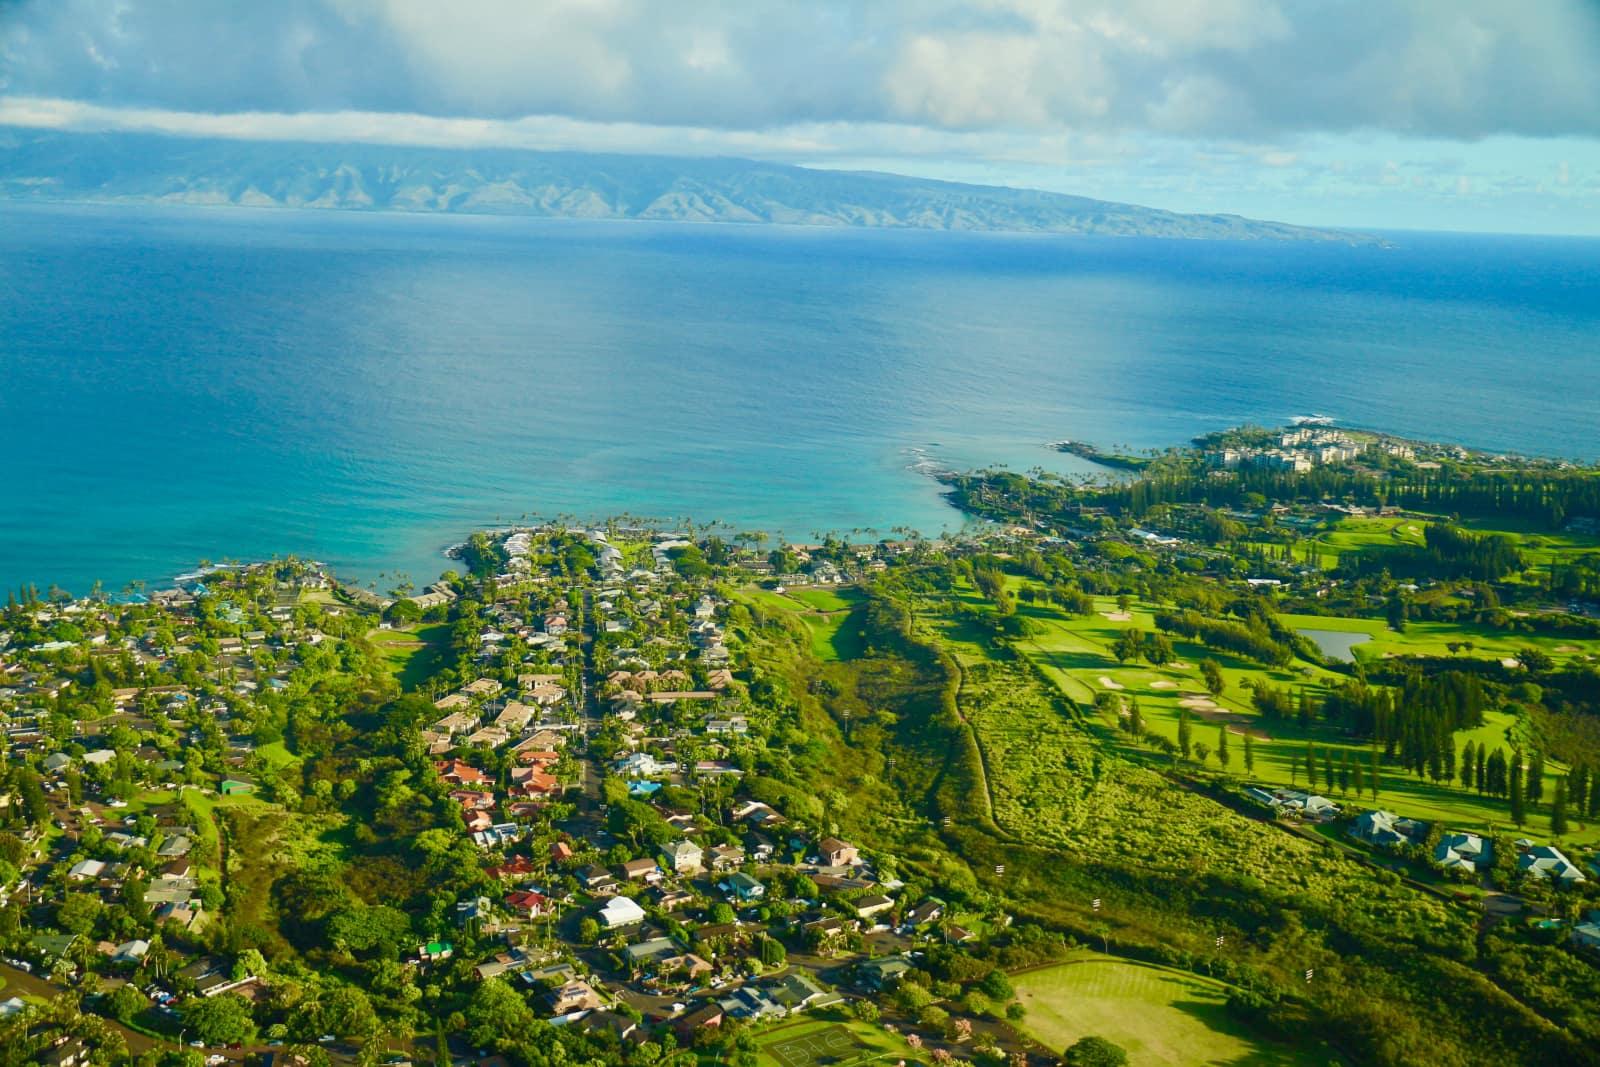 Mauai Napili Valley